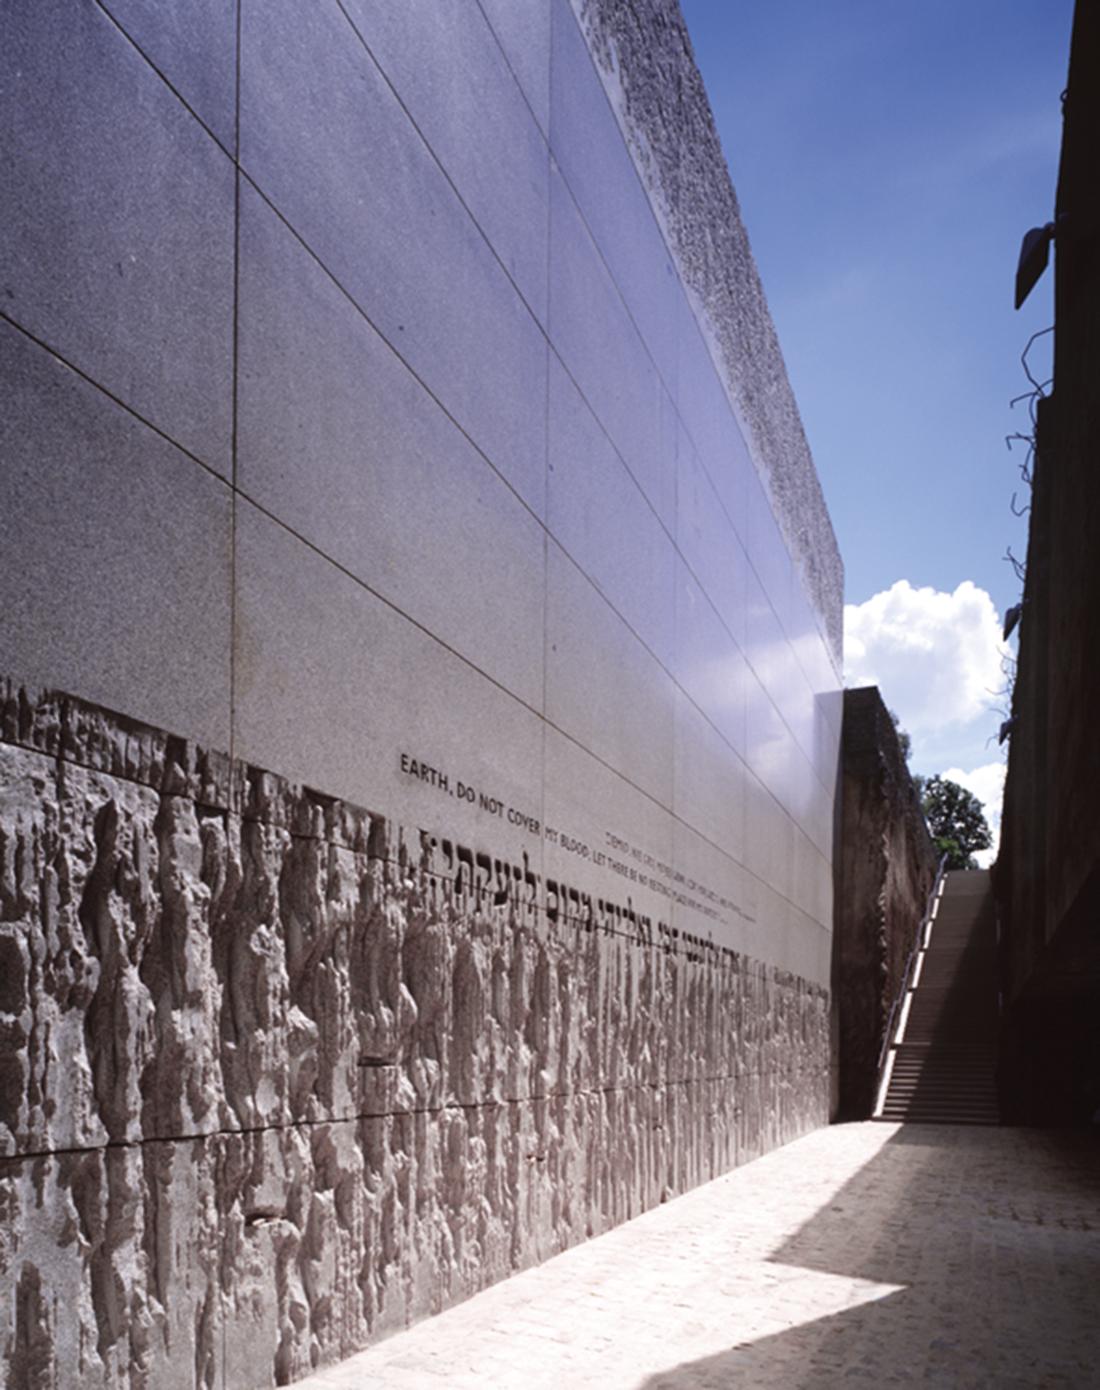 Mauzoleum wBełżcu